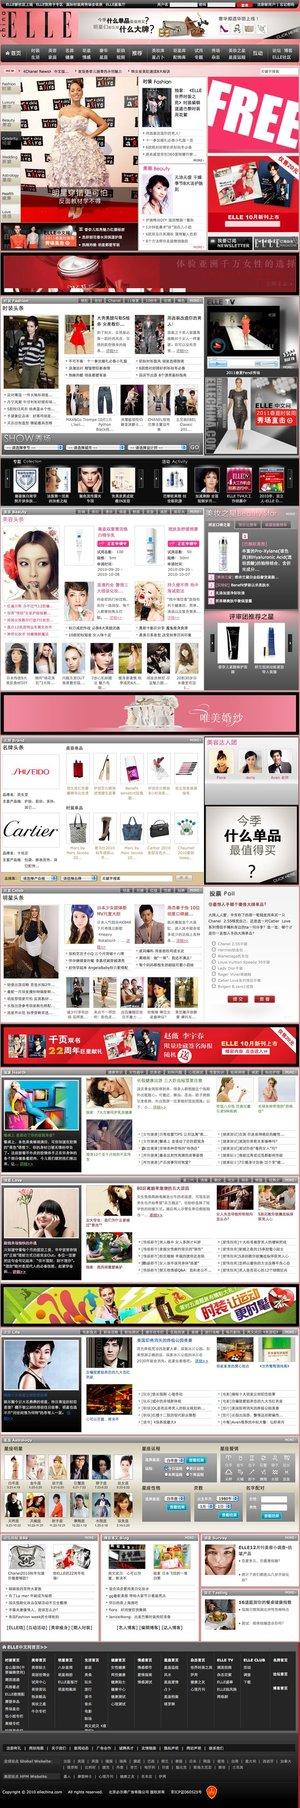 ELLE中国中福在线官网